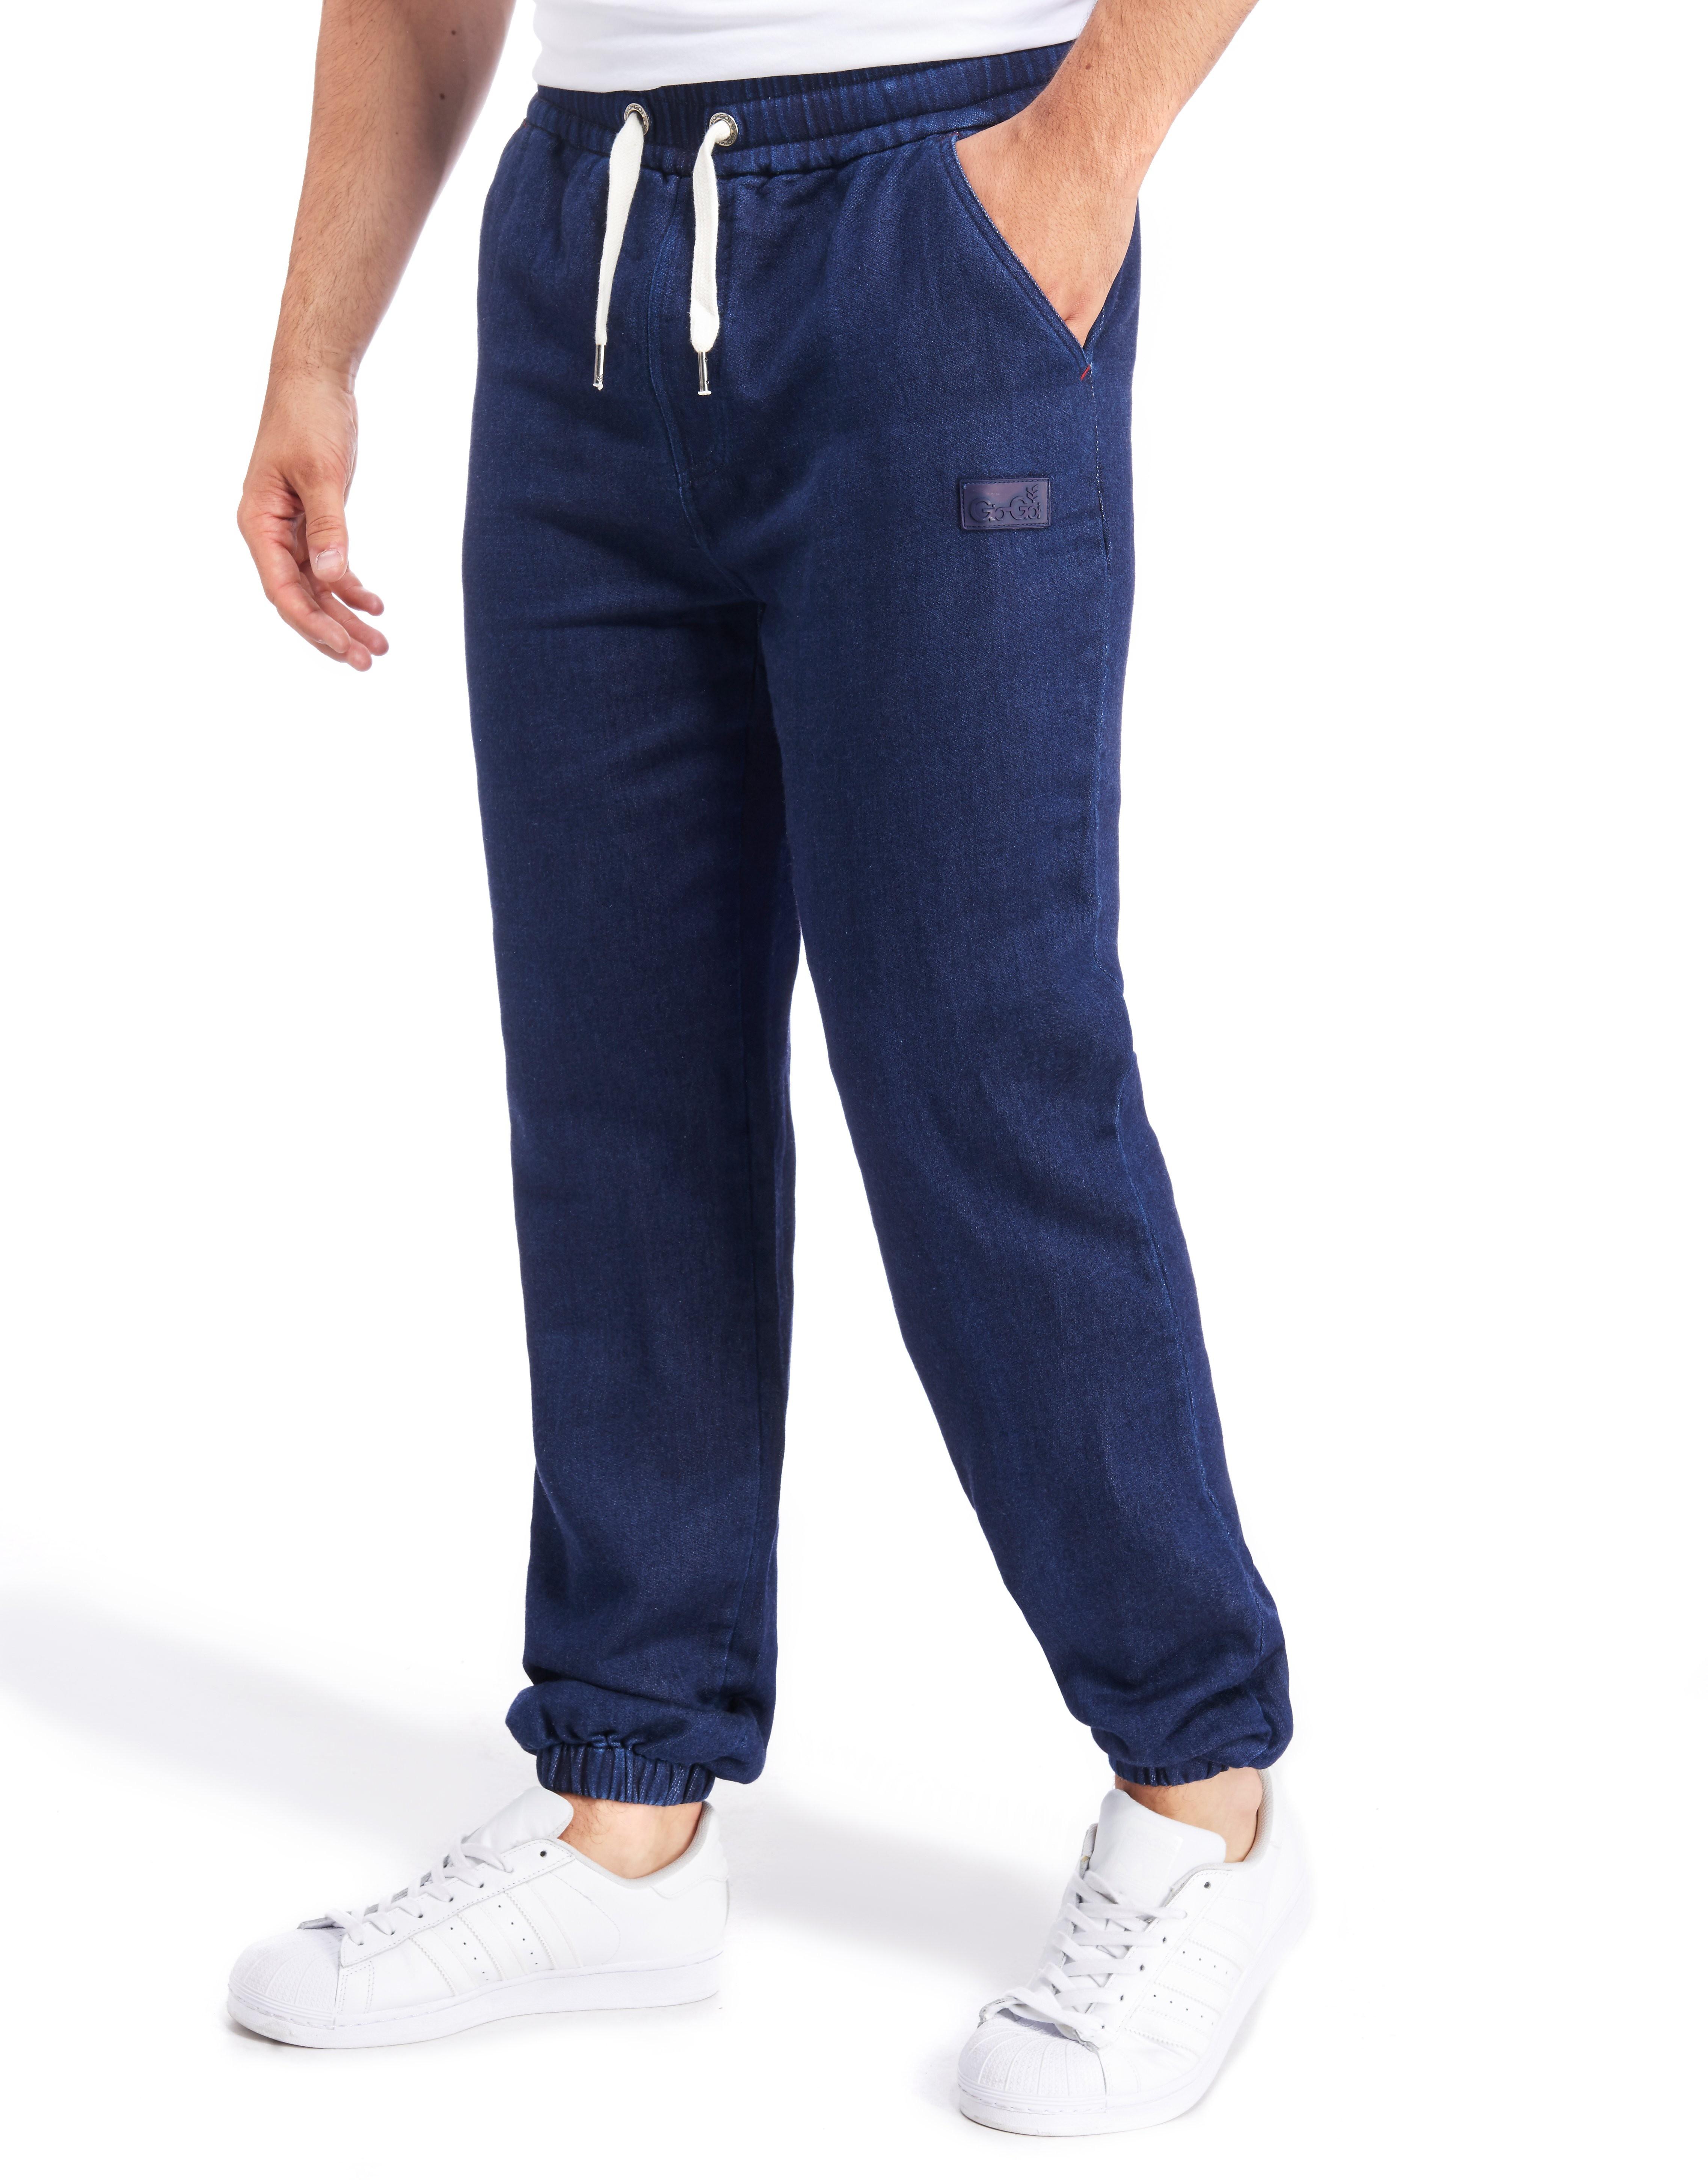 Gio-Goi Cholton Denim Jogging Pants